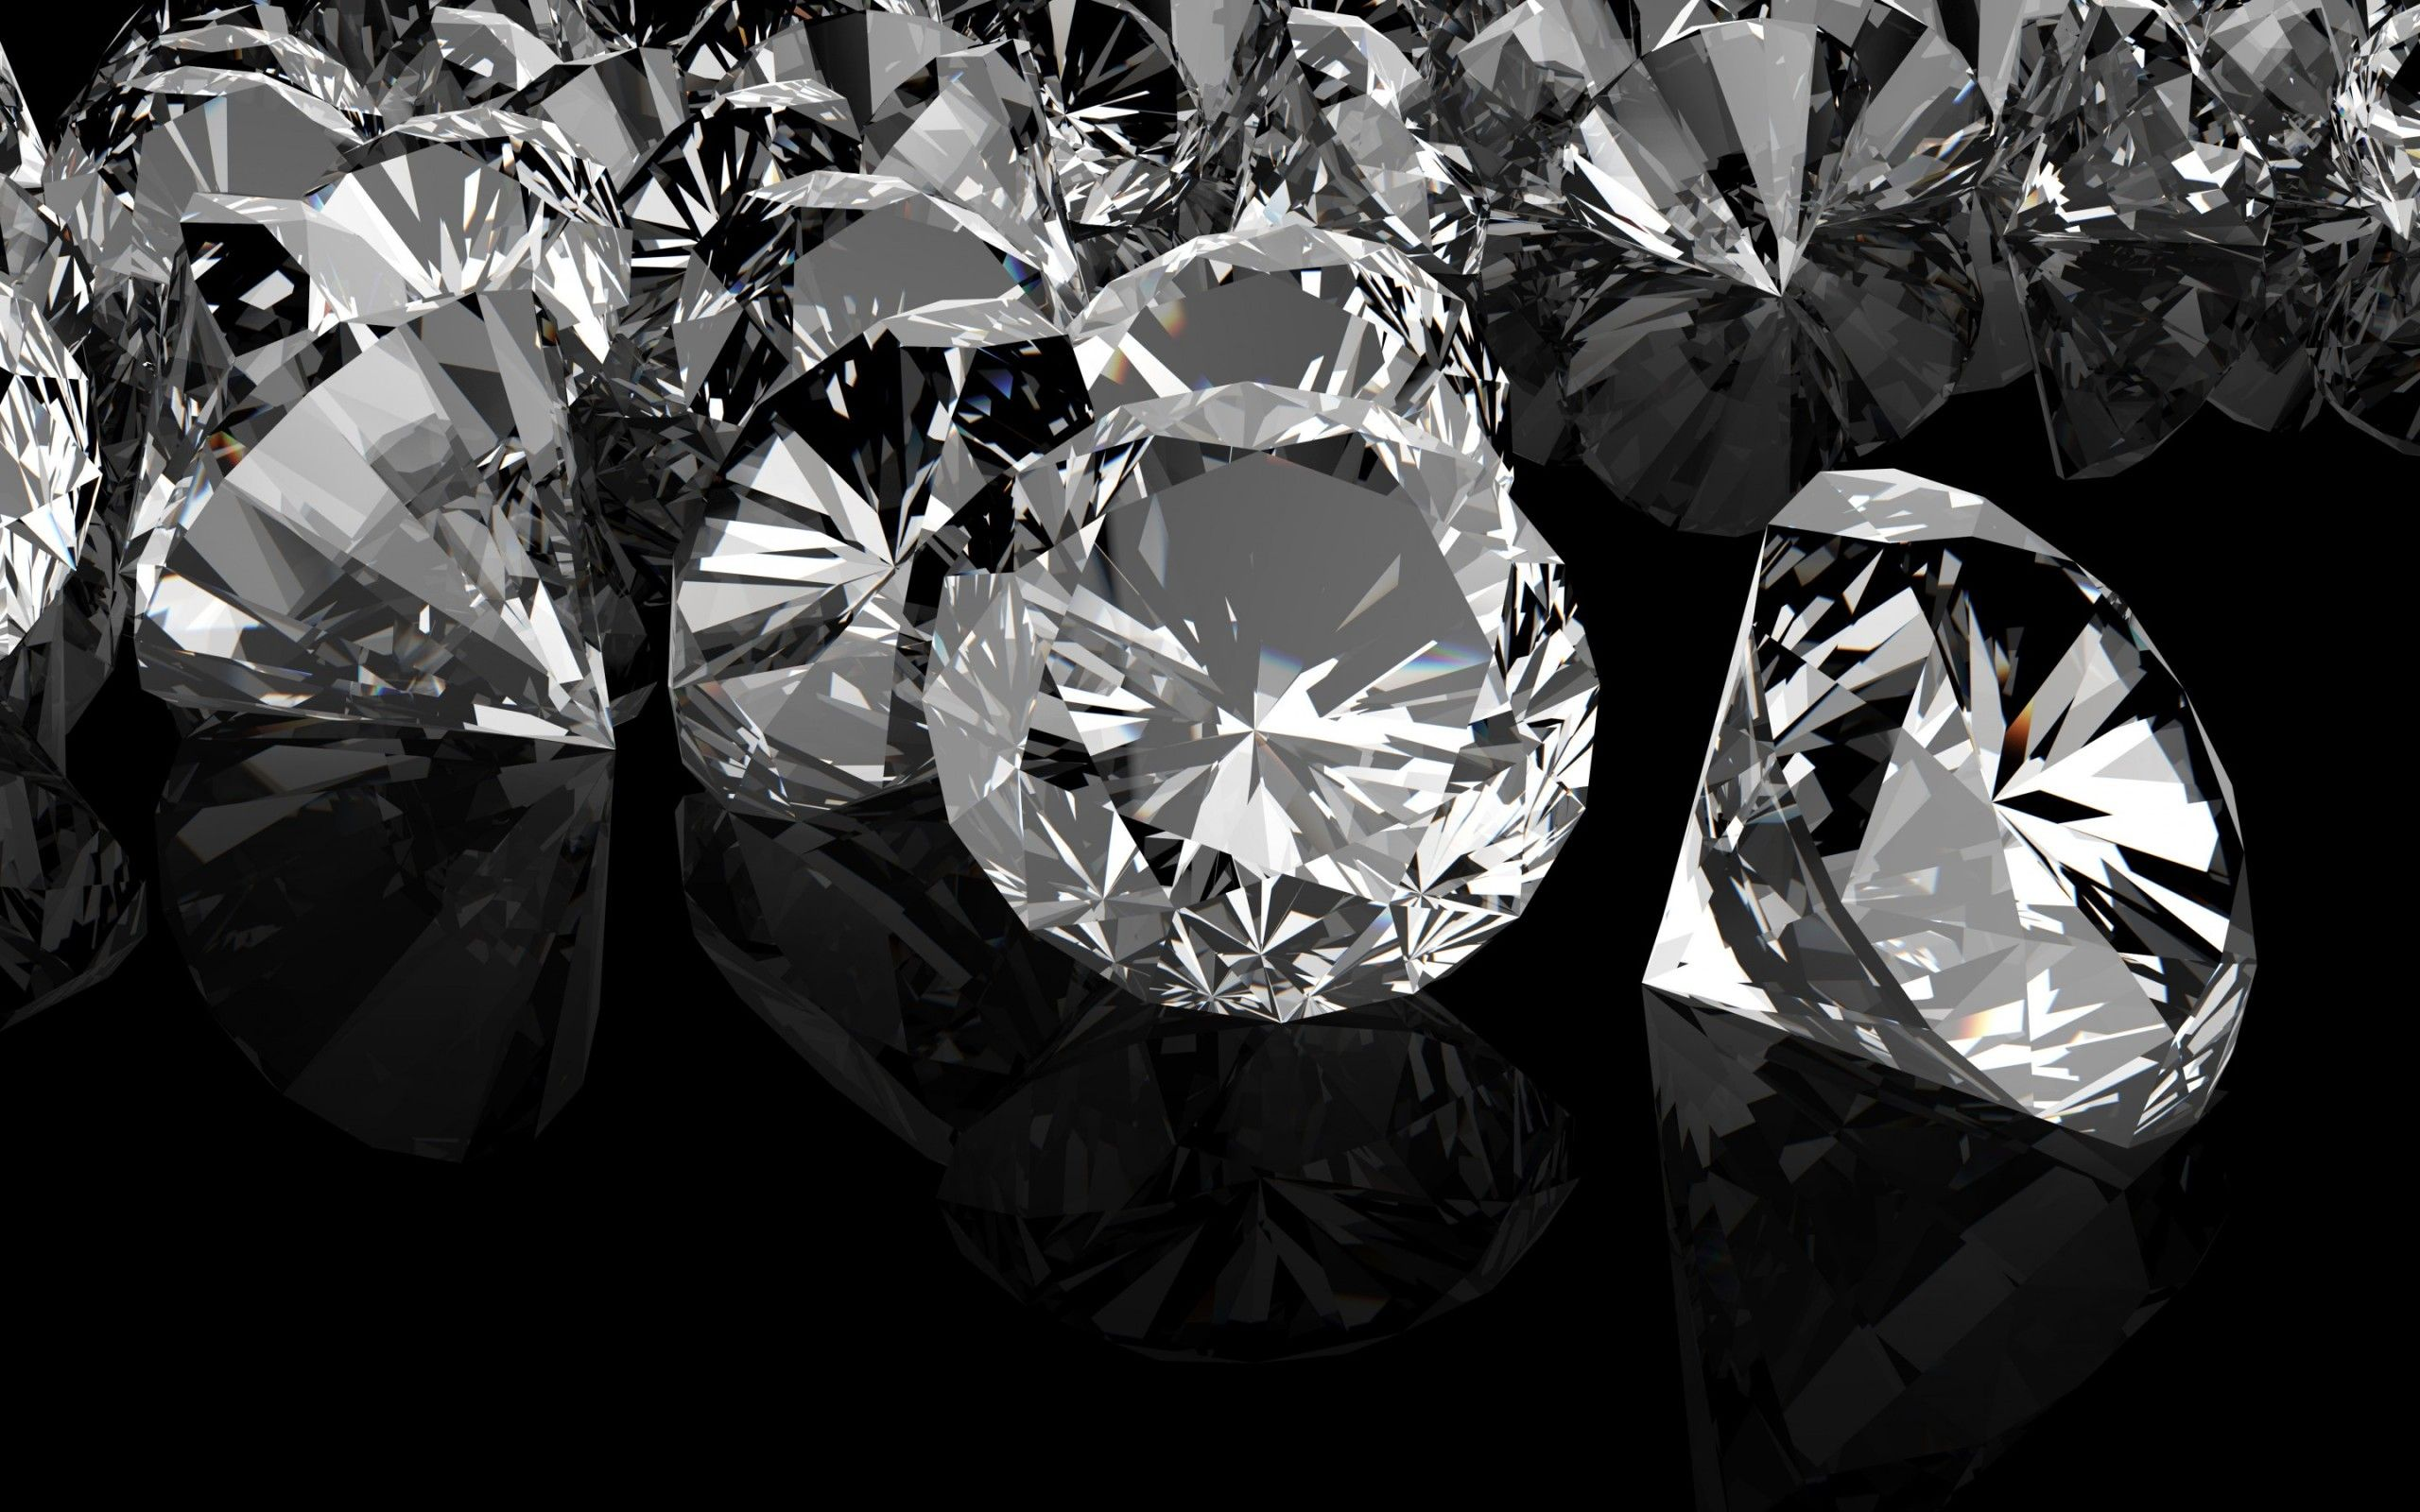 Diamonds Widescreen Wallpaper Wide Wallpapers Net Real Black Diamonds Wallpaper Wallpapers Free Do Diamond Wallpaper Black Diamond Wallpaper Diamond Background